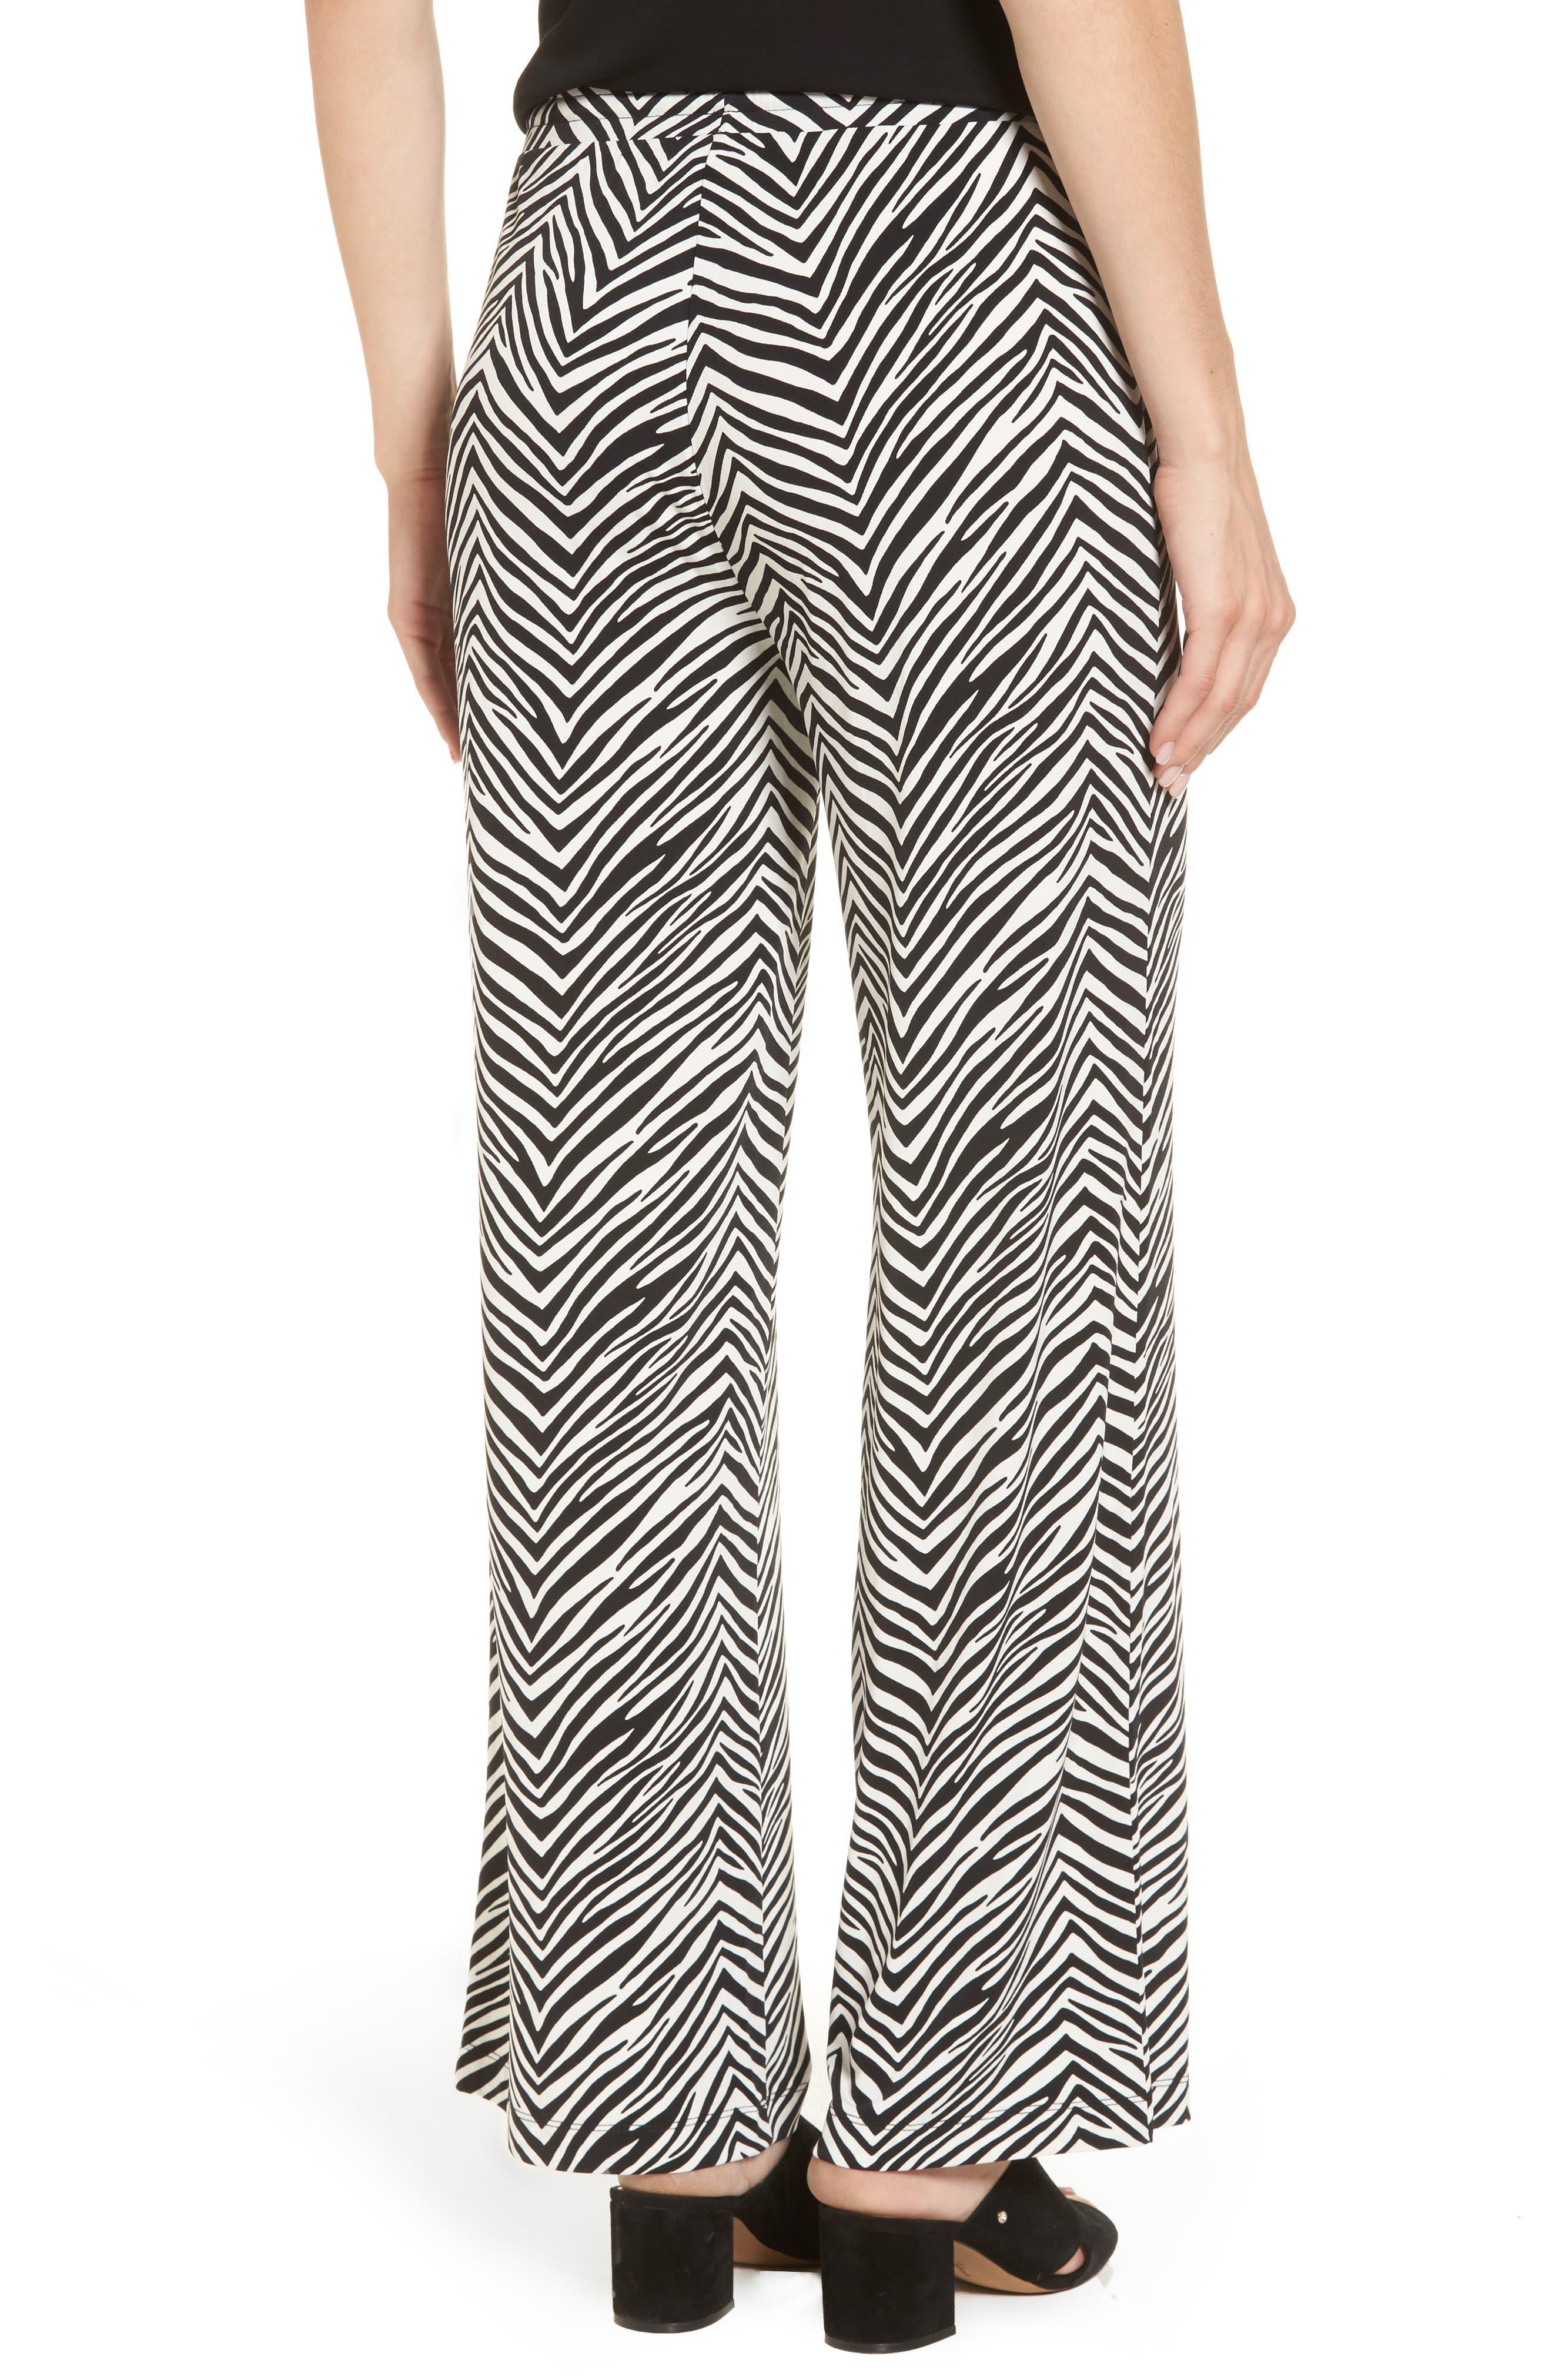 Zebra Print Drawstring Waist Pants,                             Alternate thumbnail 2, color,                             Rich Black